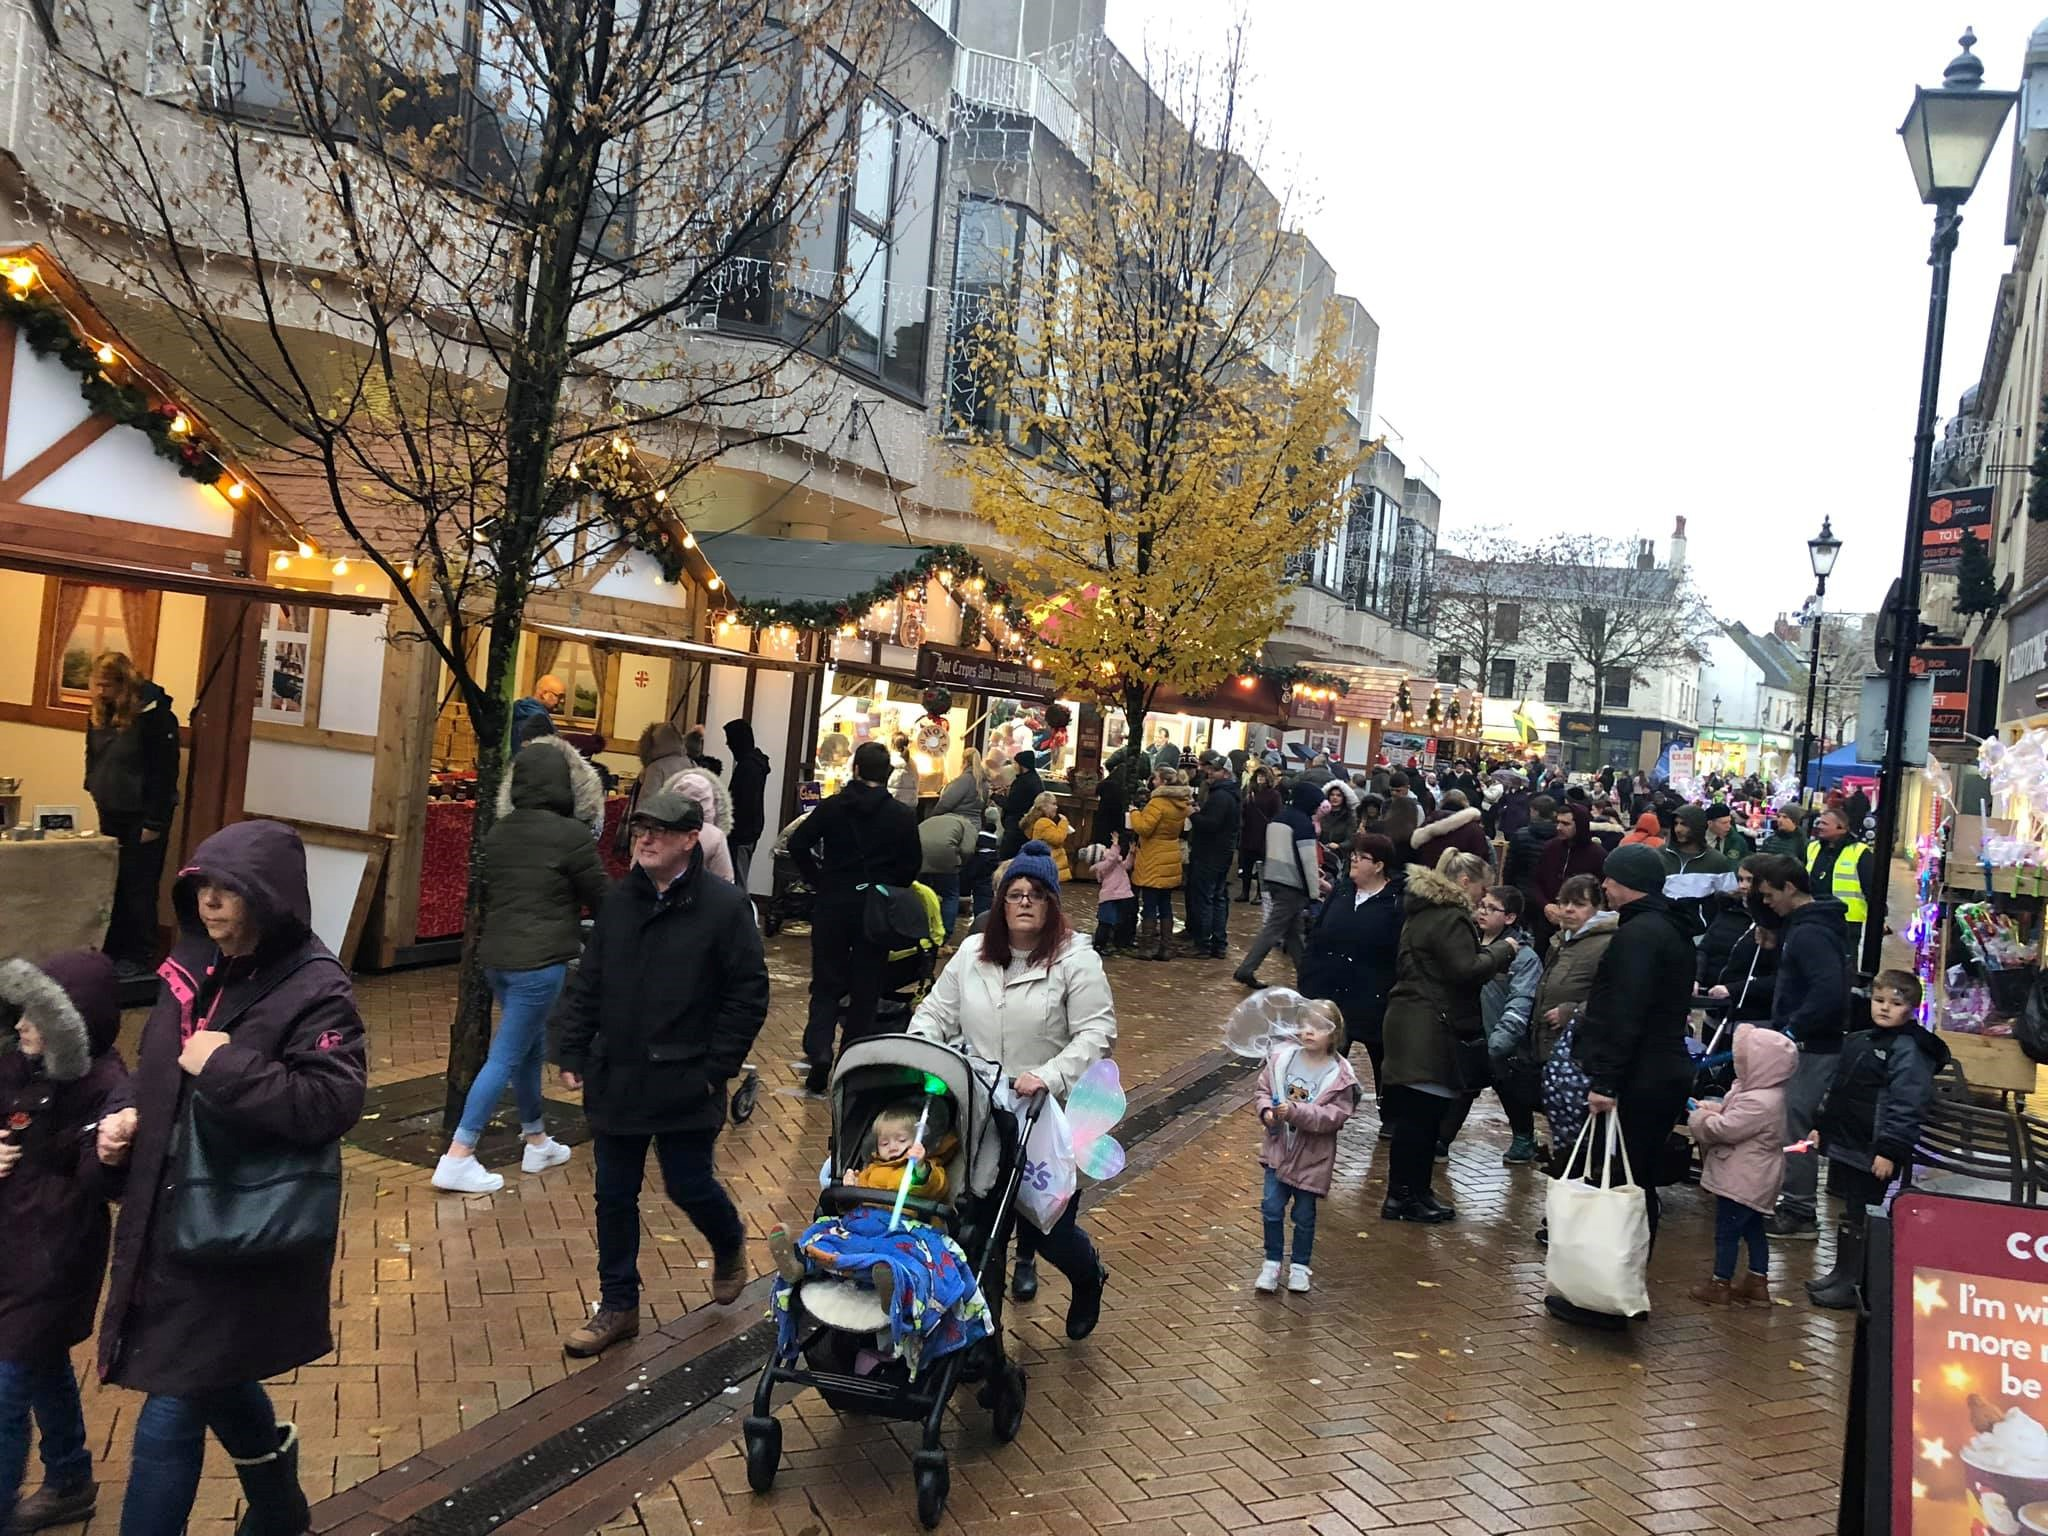 Planning underway for Mansfield's popular Christmas market